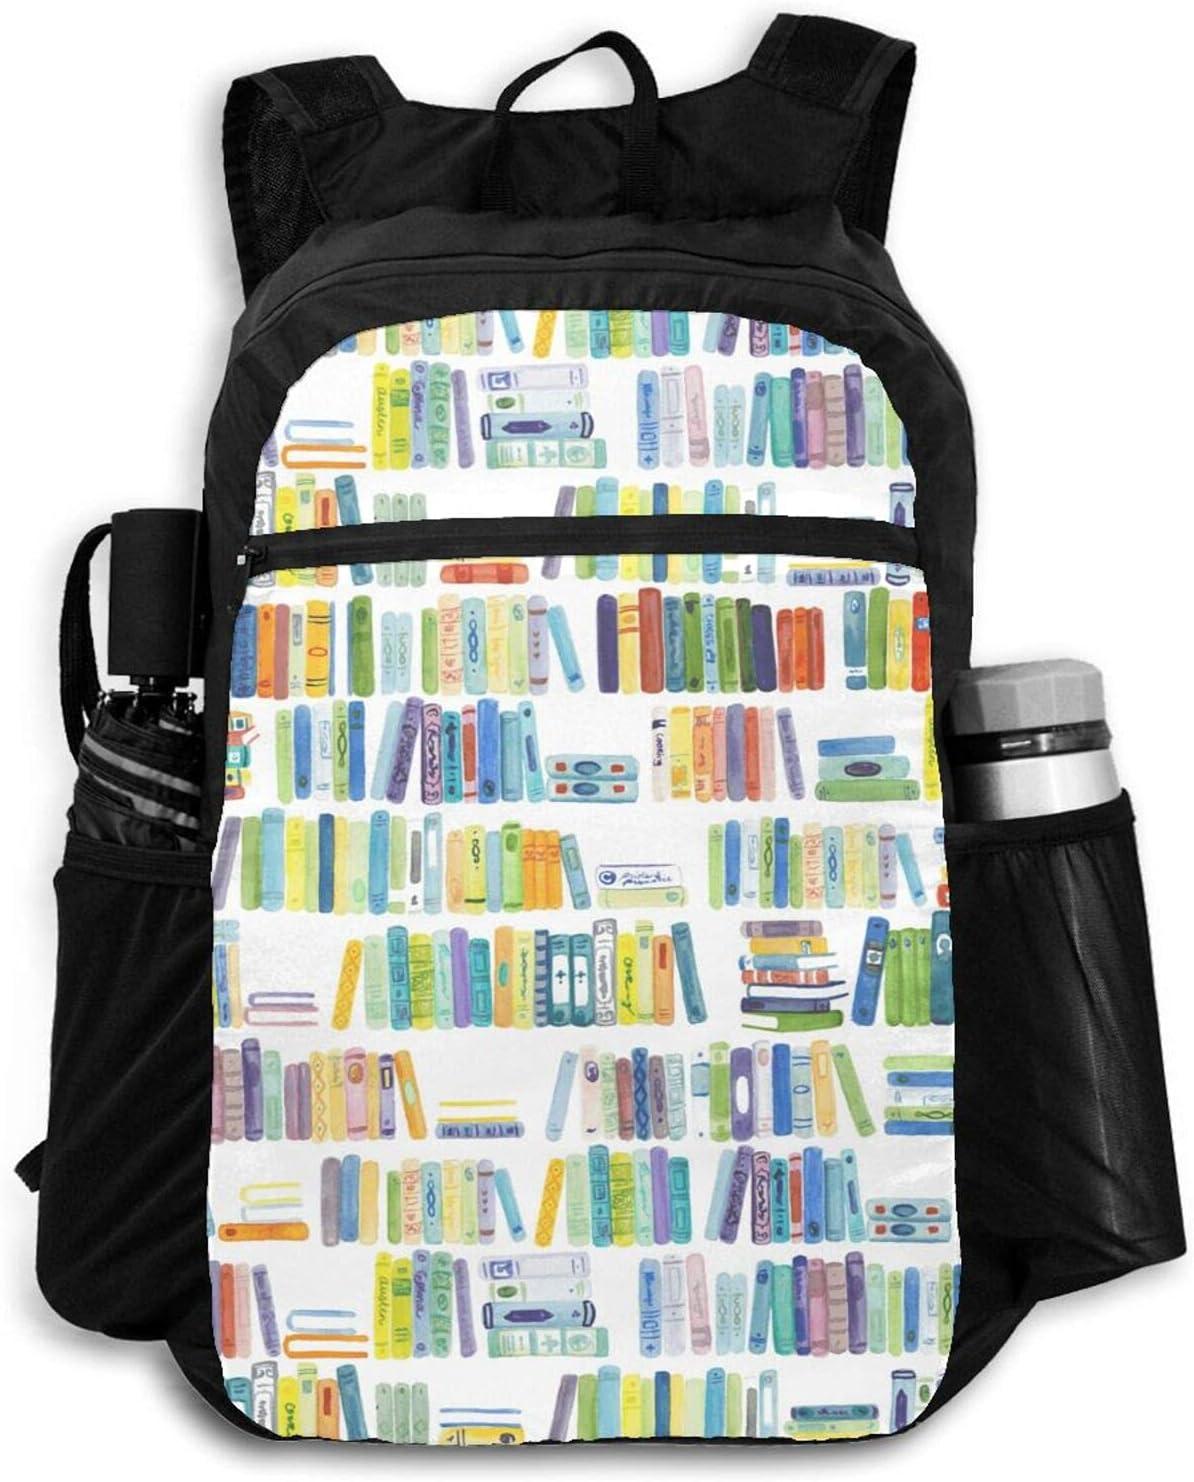 Zolama Books Backpacks Sacramento Mall for Women Light Men Bargain sale Daypack Packable Cute